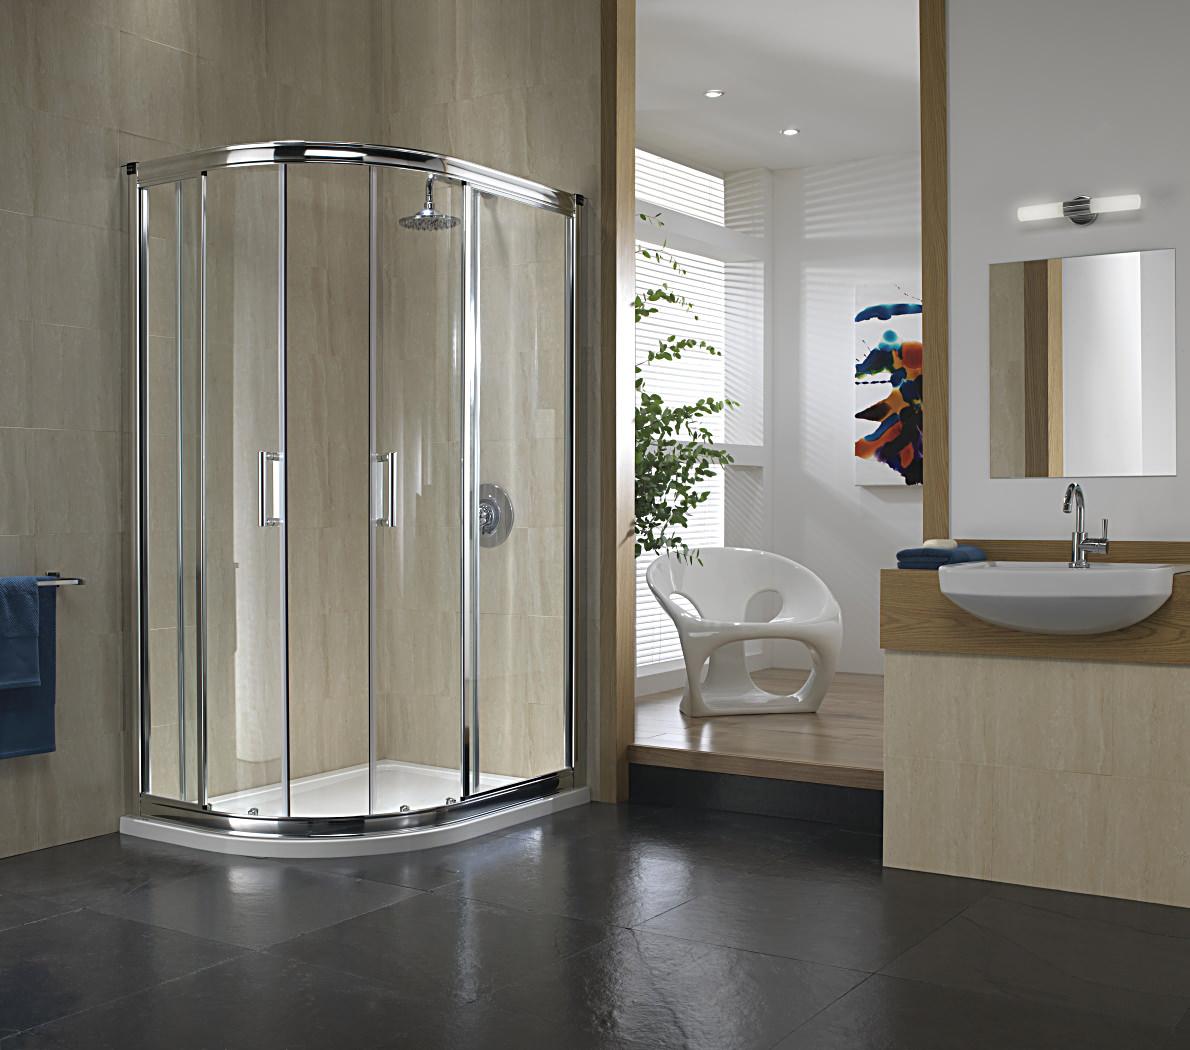 supastore bathroom shower enclosure sliding